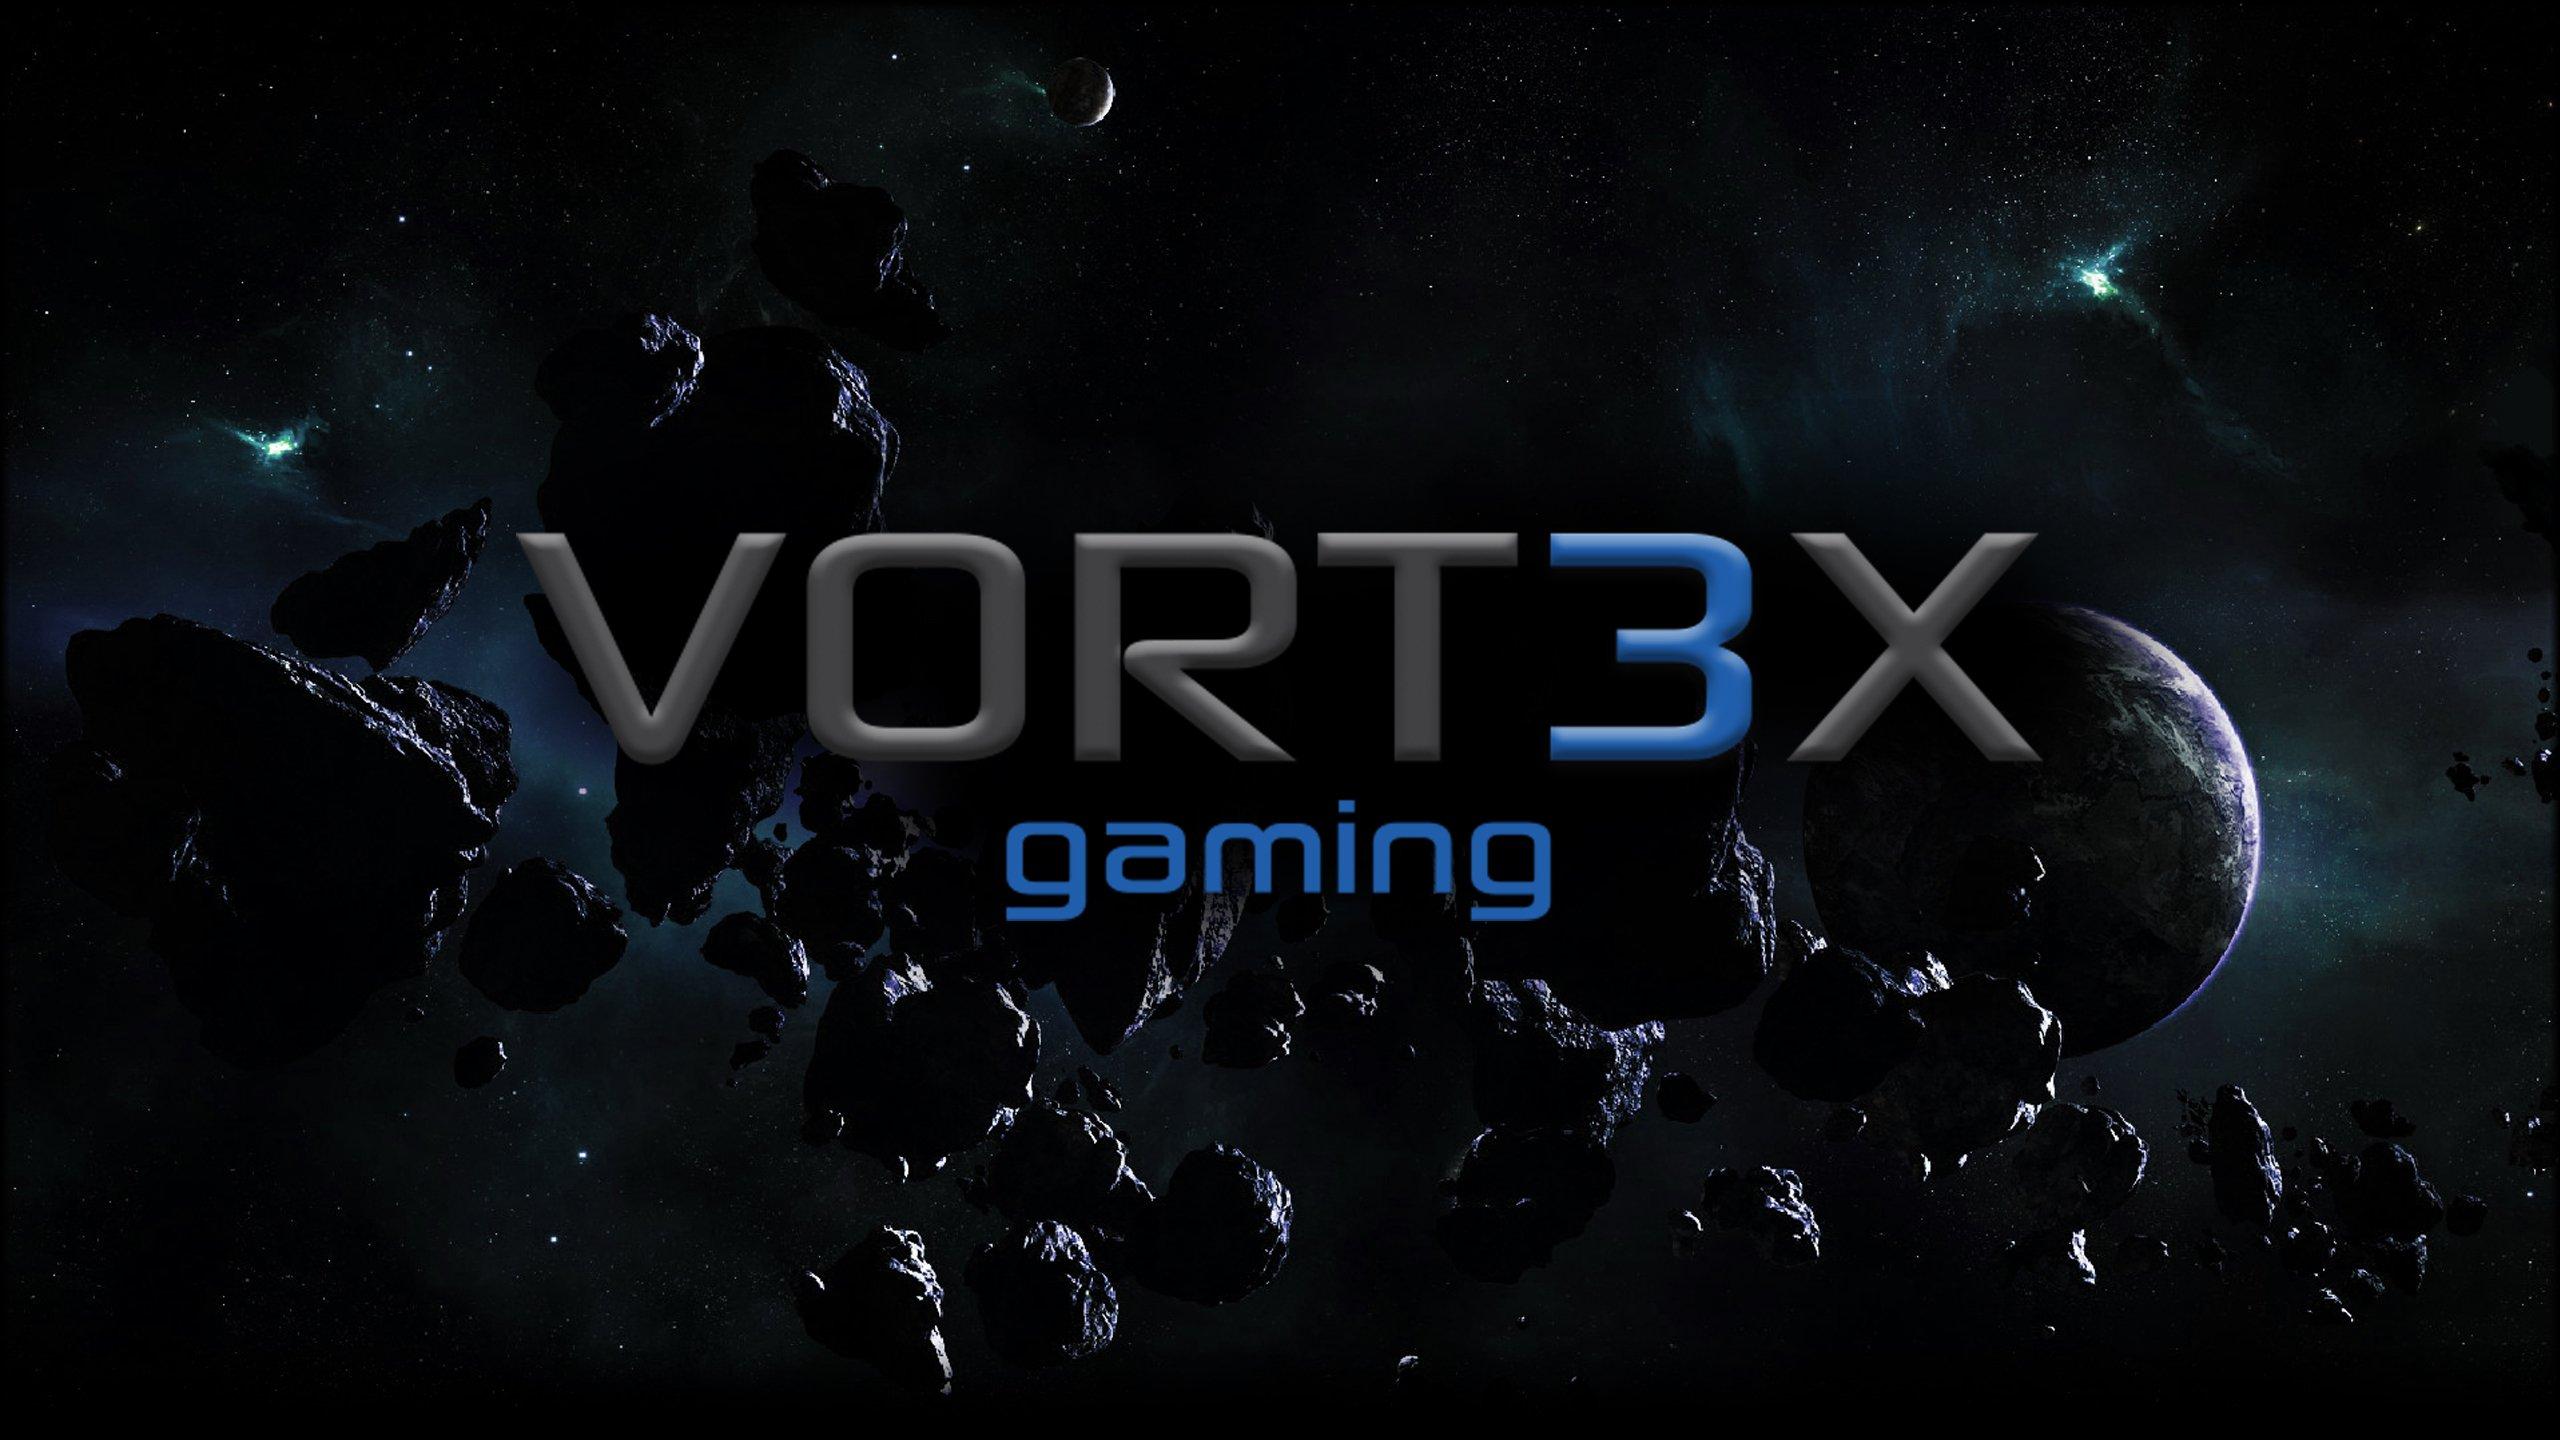 VORT3X gaming